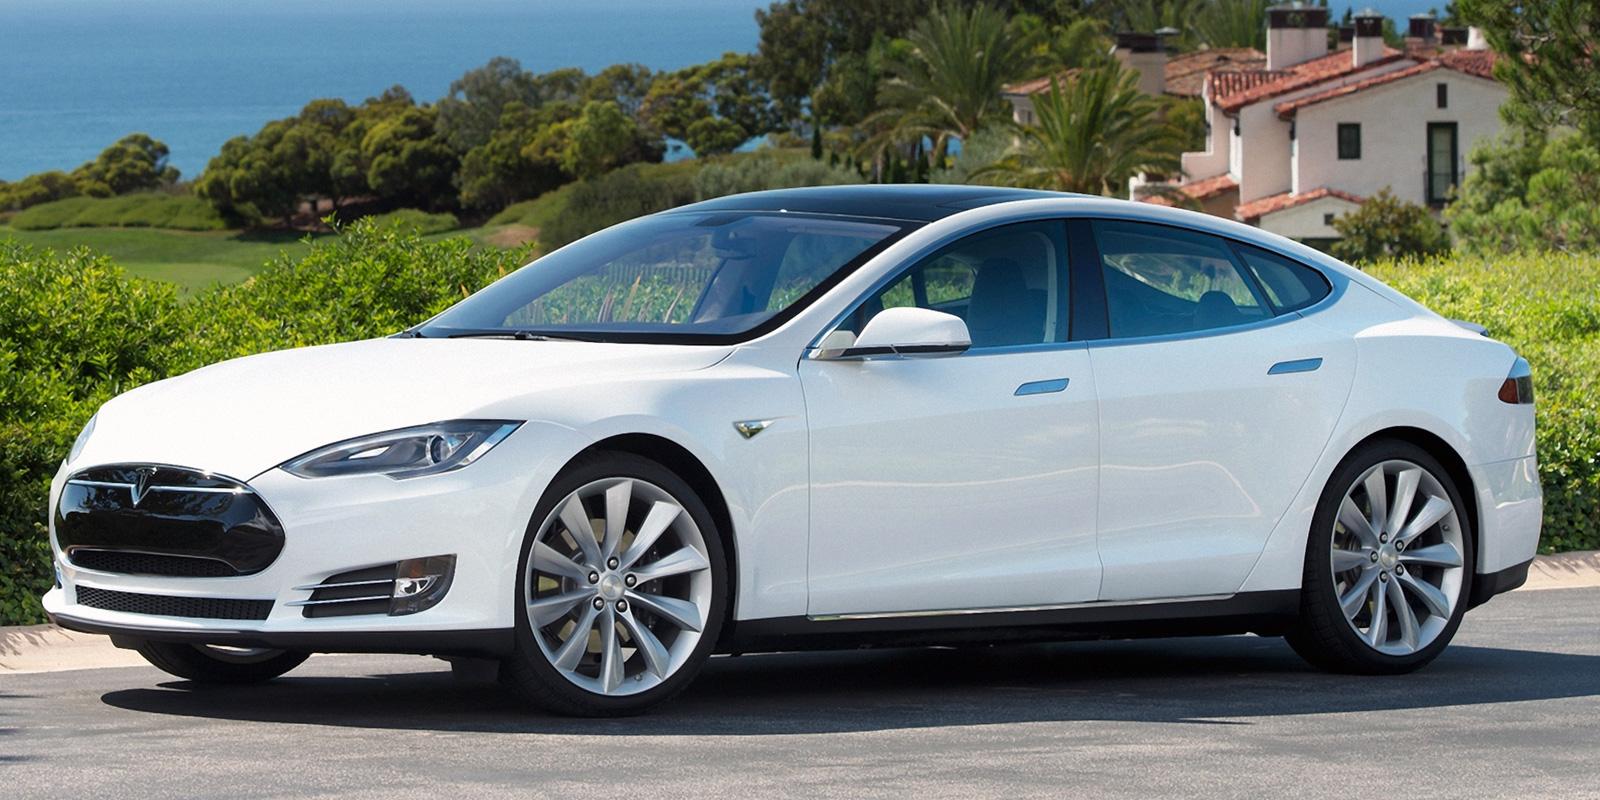 тесла автомобиль цена 2014